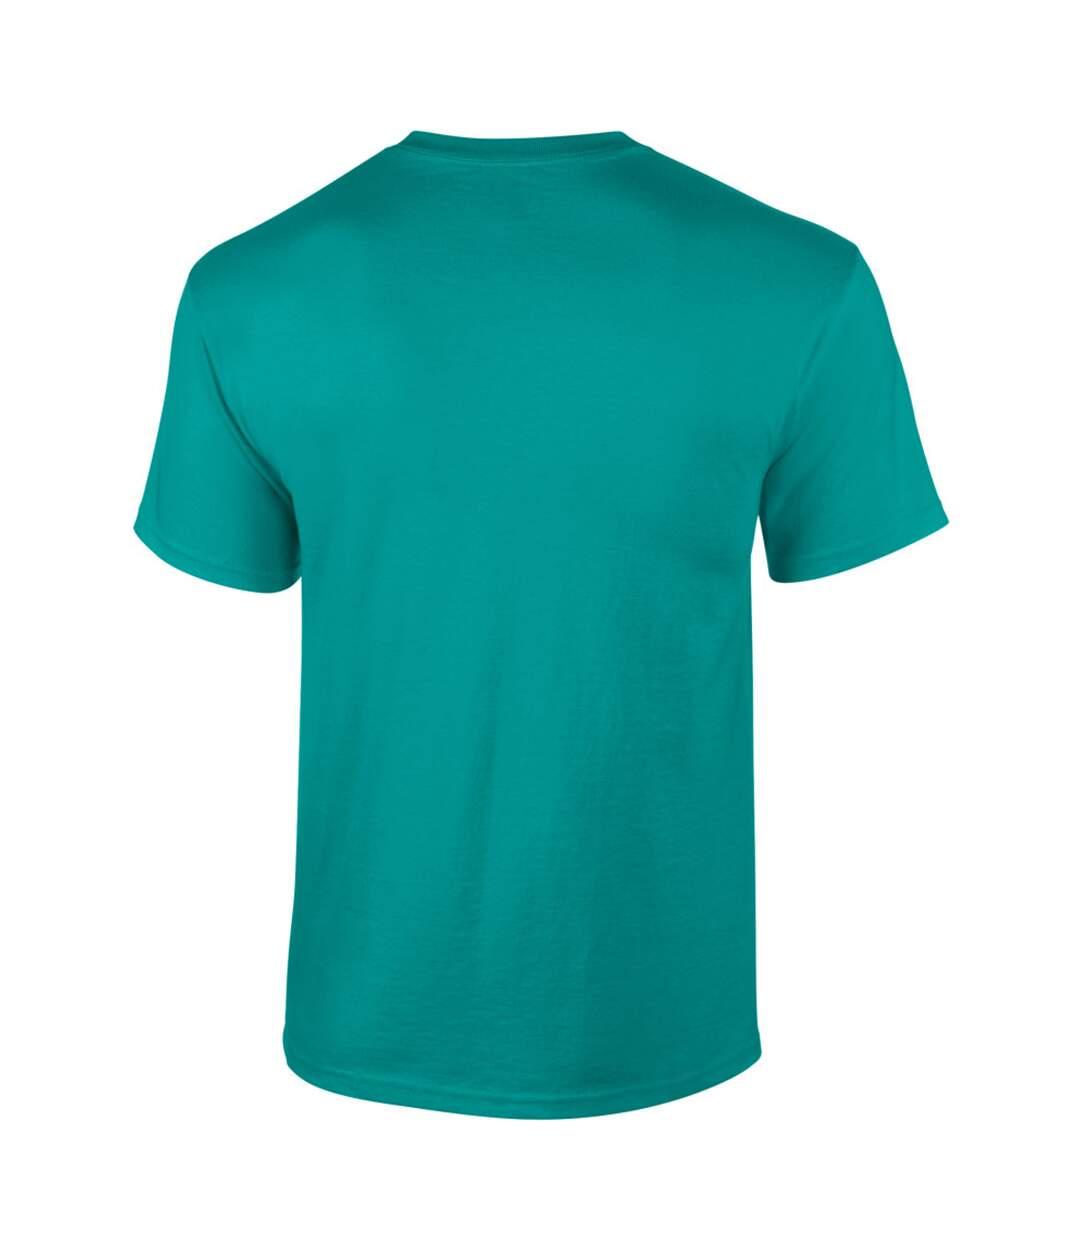 Gildan - T-shirt à manches courtes - Homme (Jade) - UTBC475